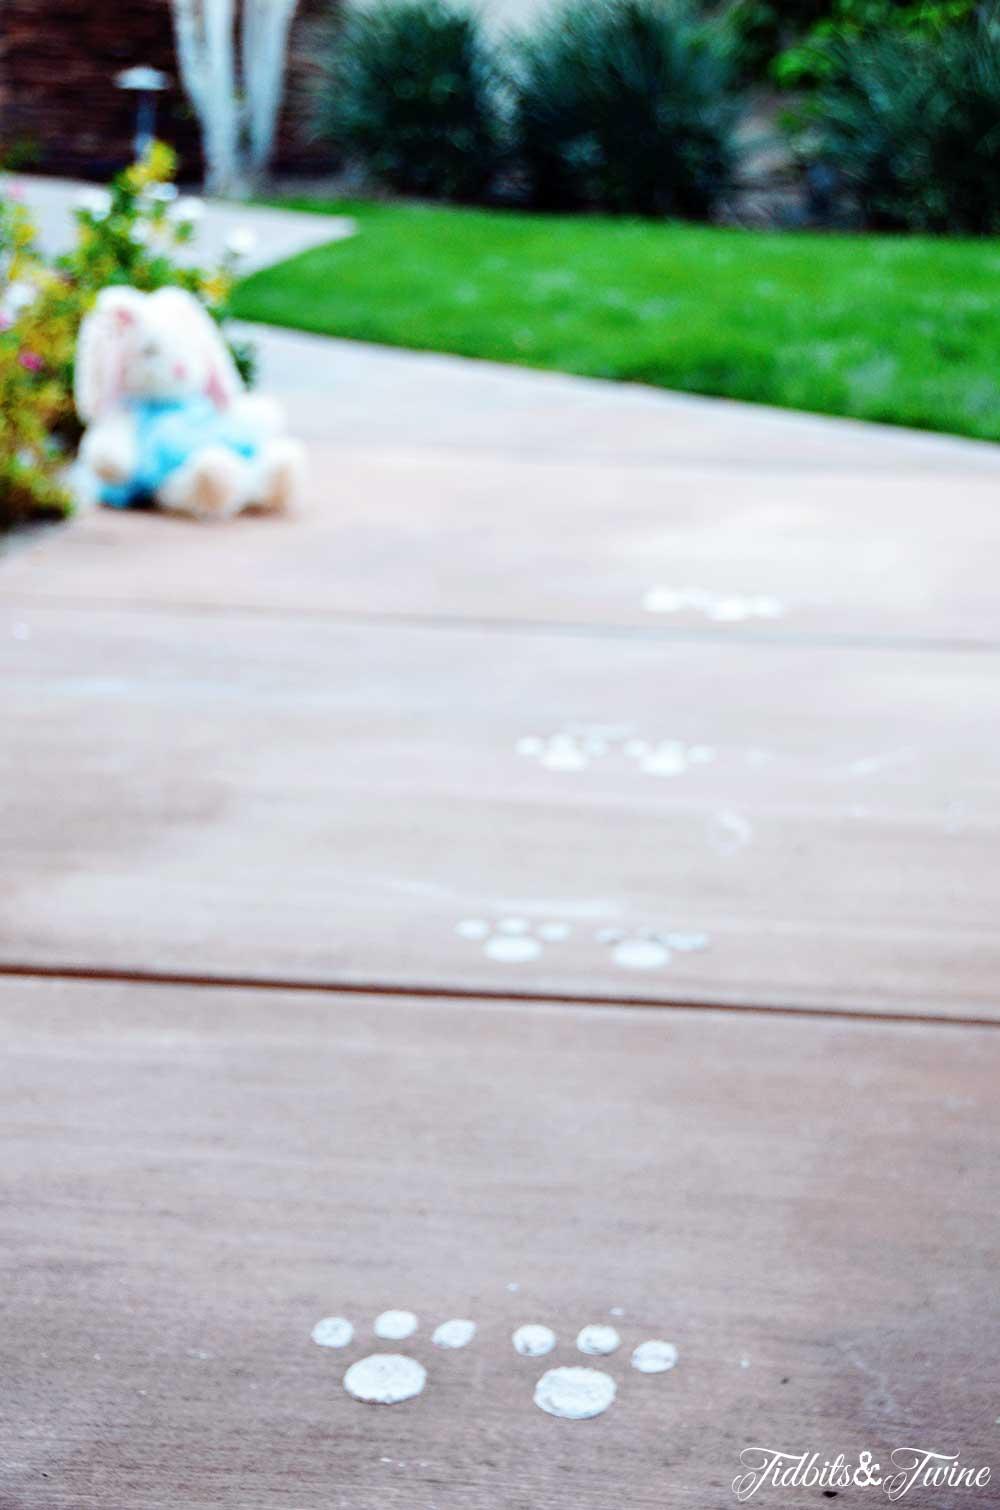 TIDBITS&TWINE - Easter Bunny Footprints